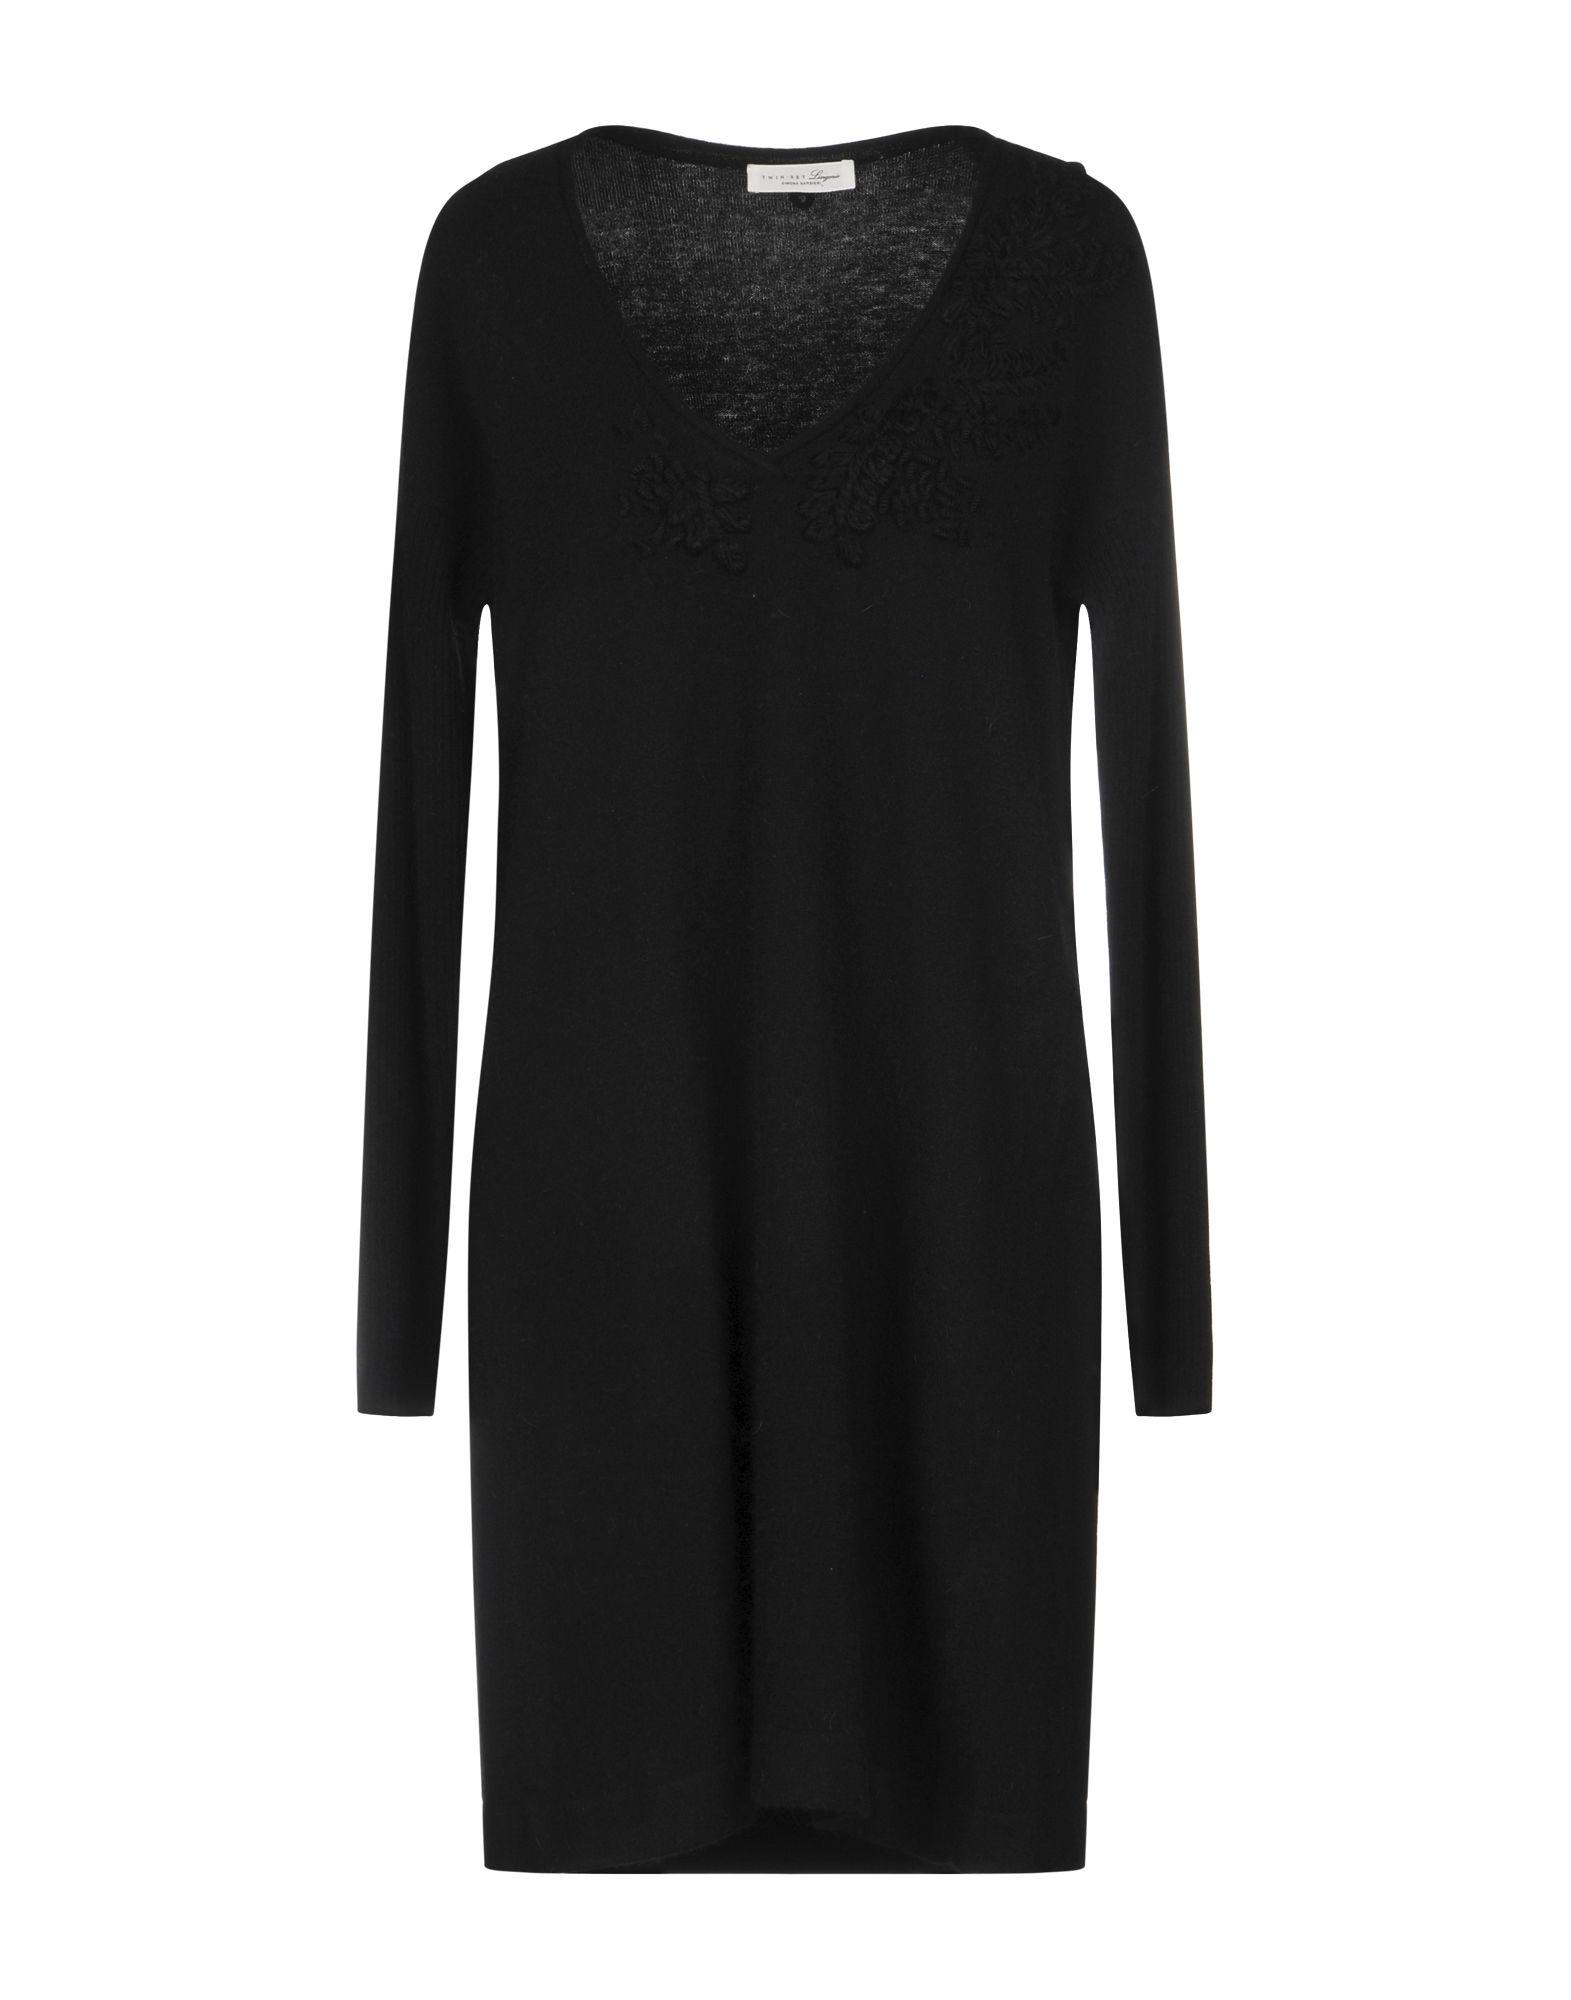 TWIN-SET LINGERIE Короткое платье black v neck lace details lingerie set